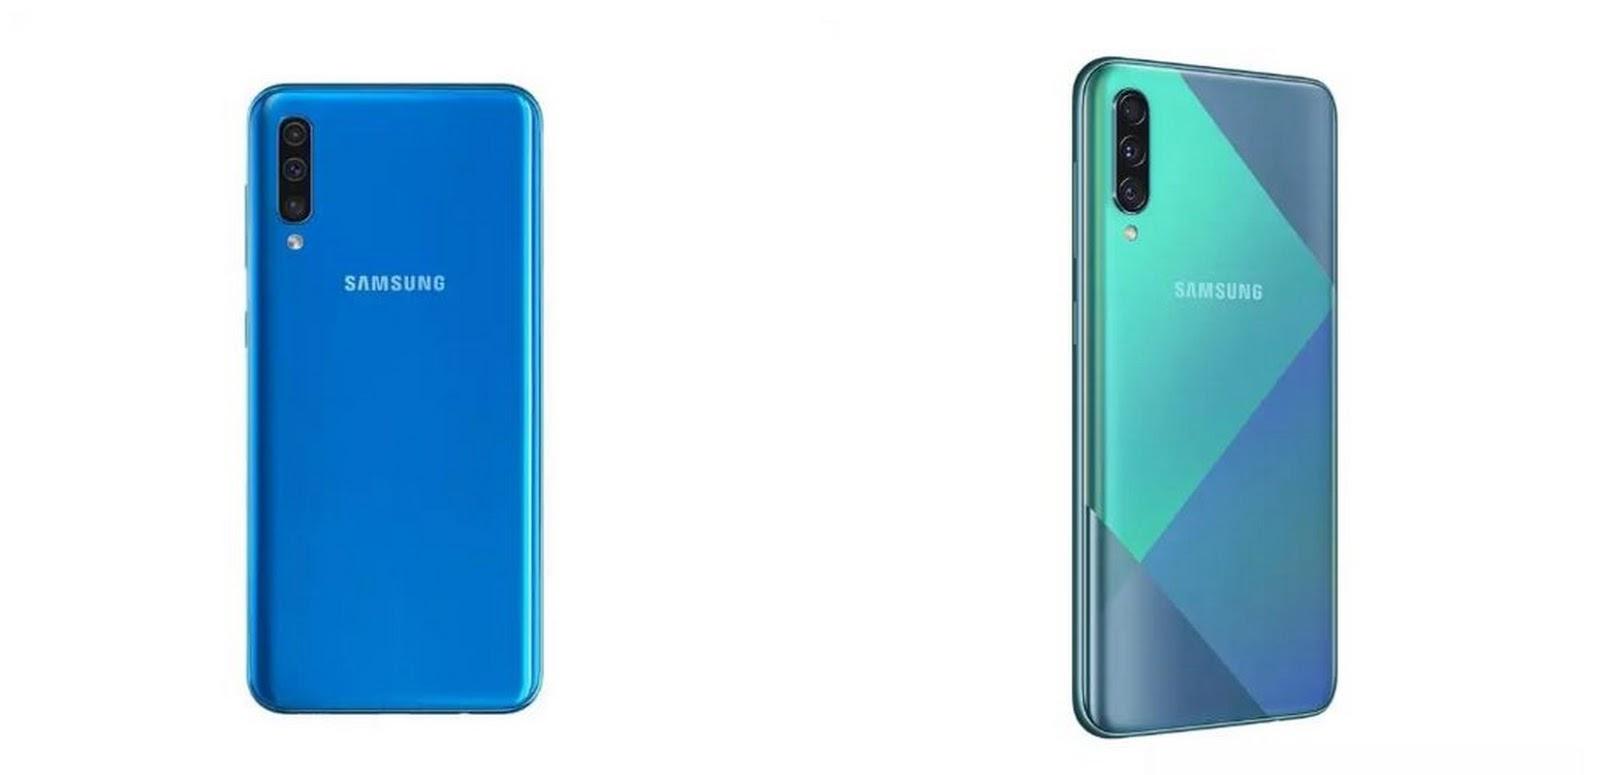 Samsung Galaxy A50s vs Galaxy A50, Apa Saja Perbedaannya?